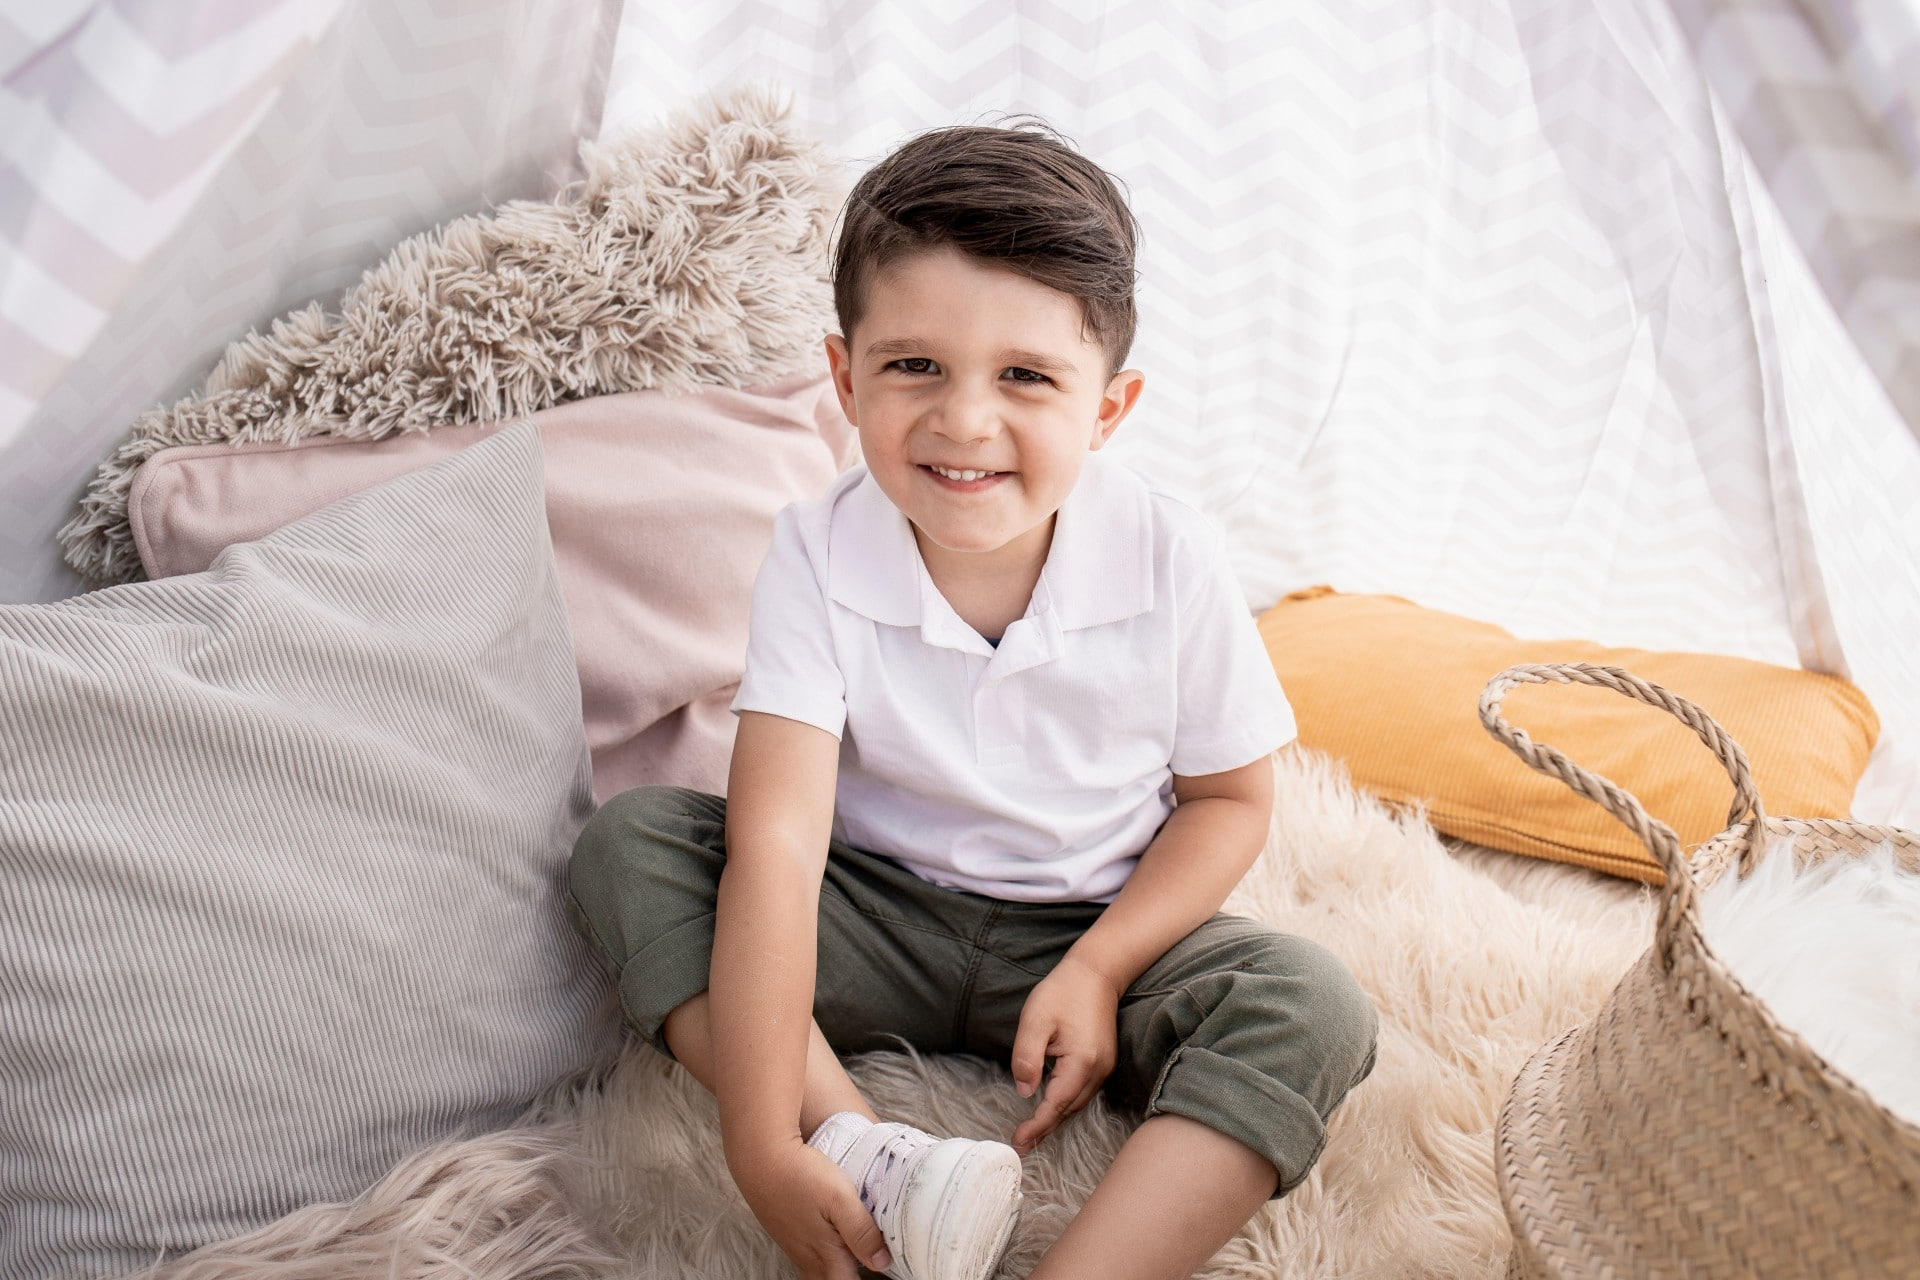 320-jennimachtfotos-Kinderbilder-nYNFYTEo